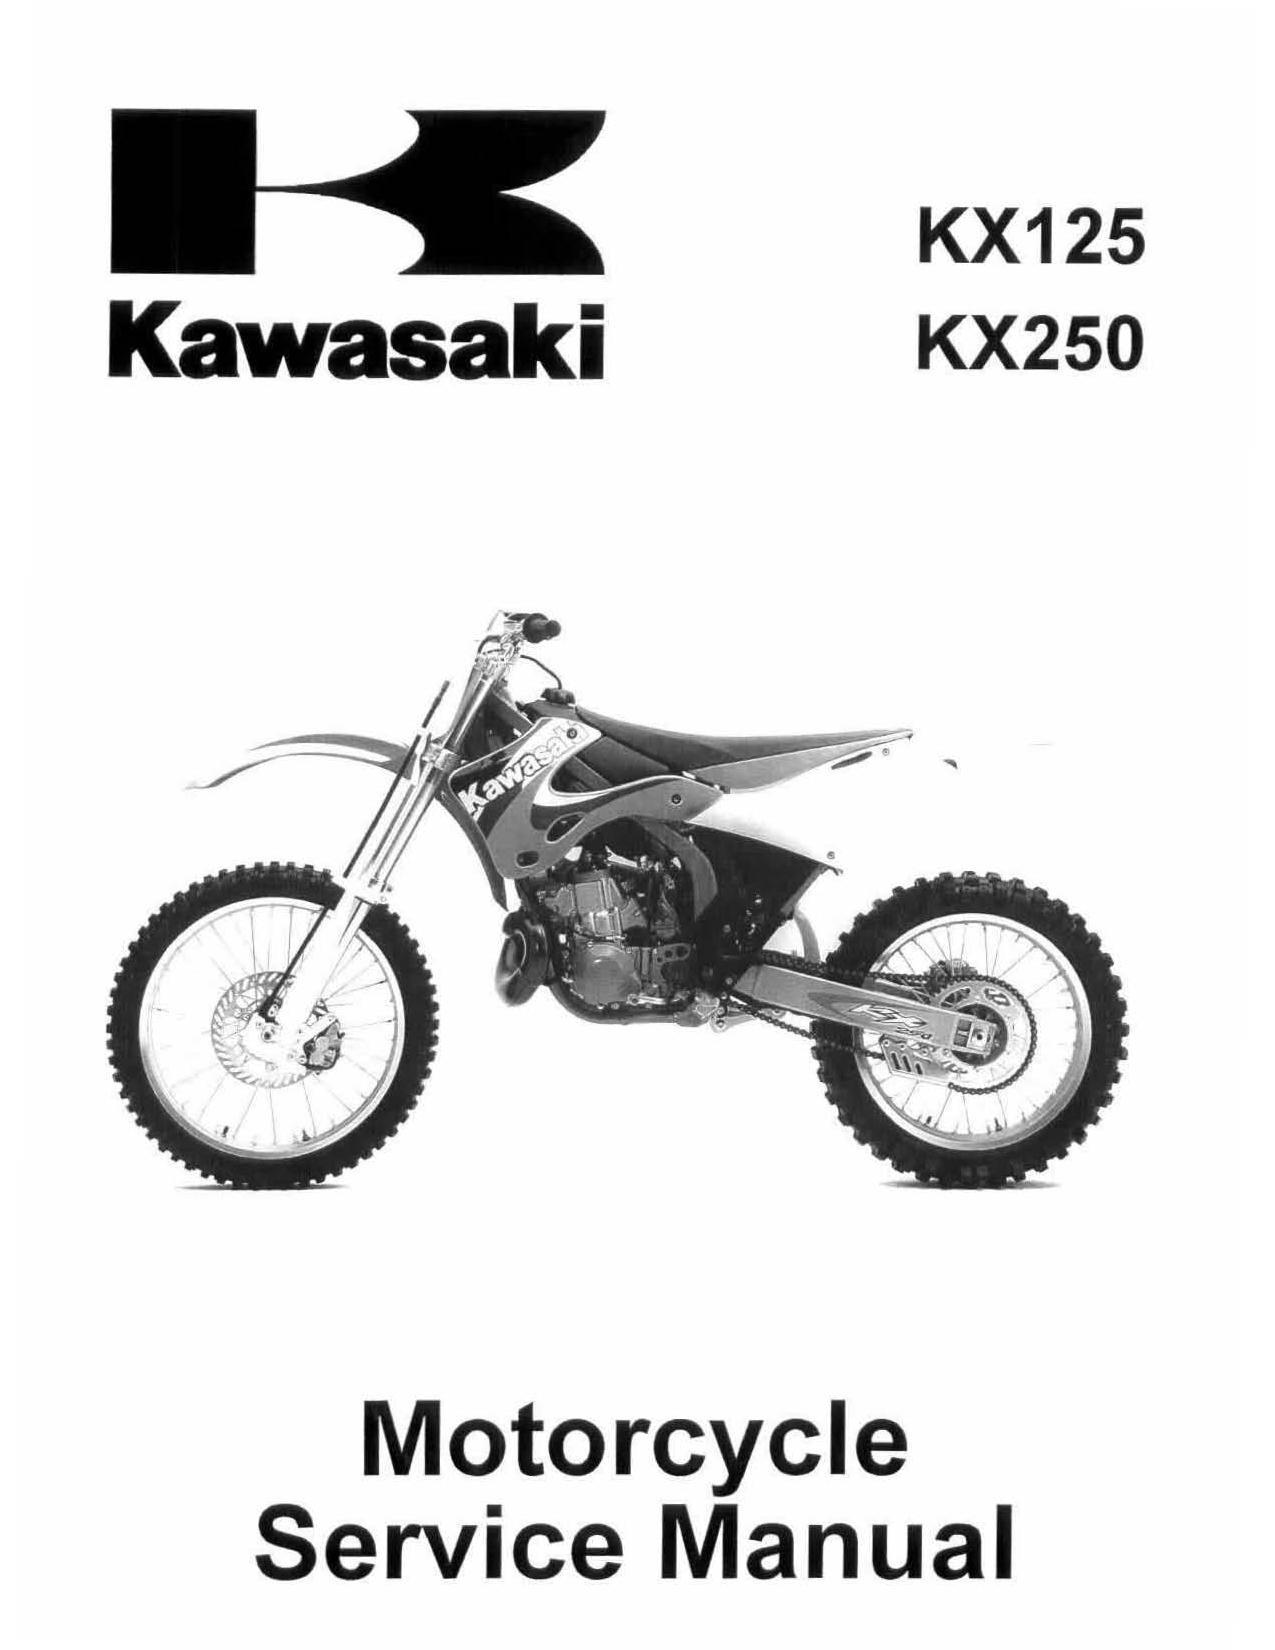 File:Kawasaki KX125 KX250 L 1999-2002 Service Manual.pdf